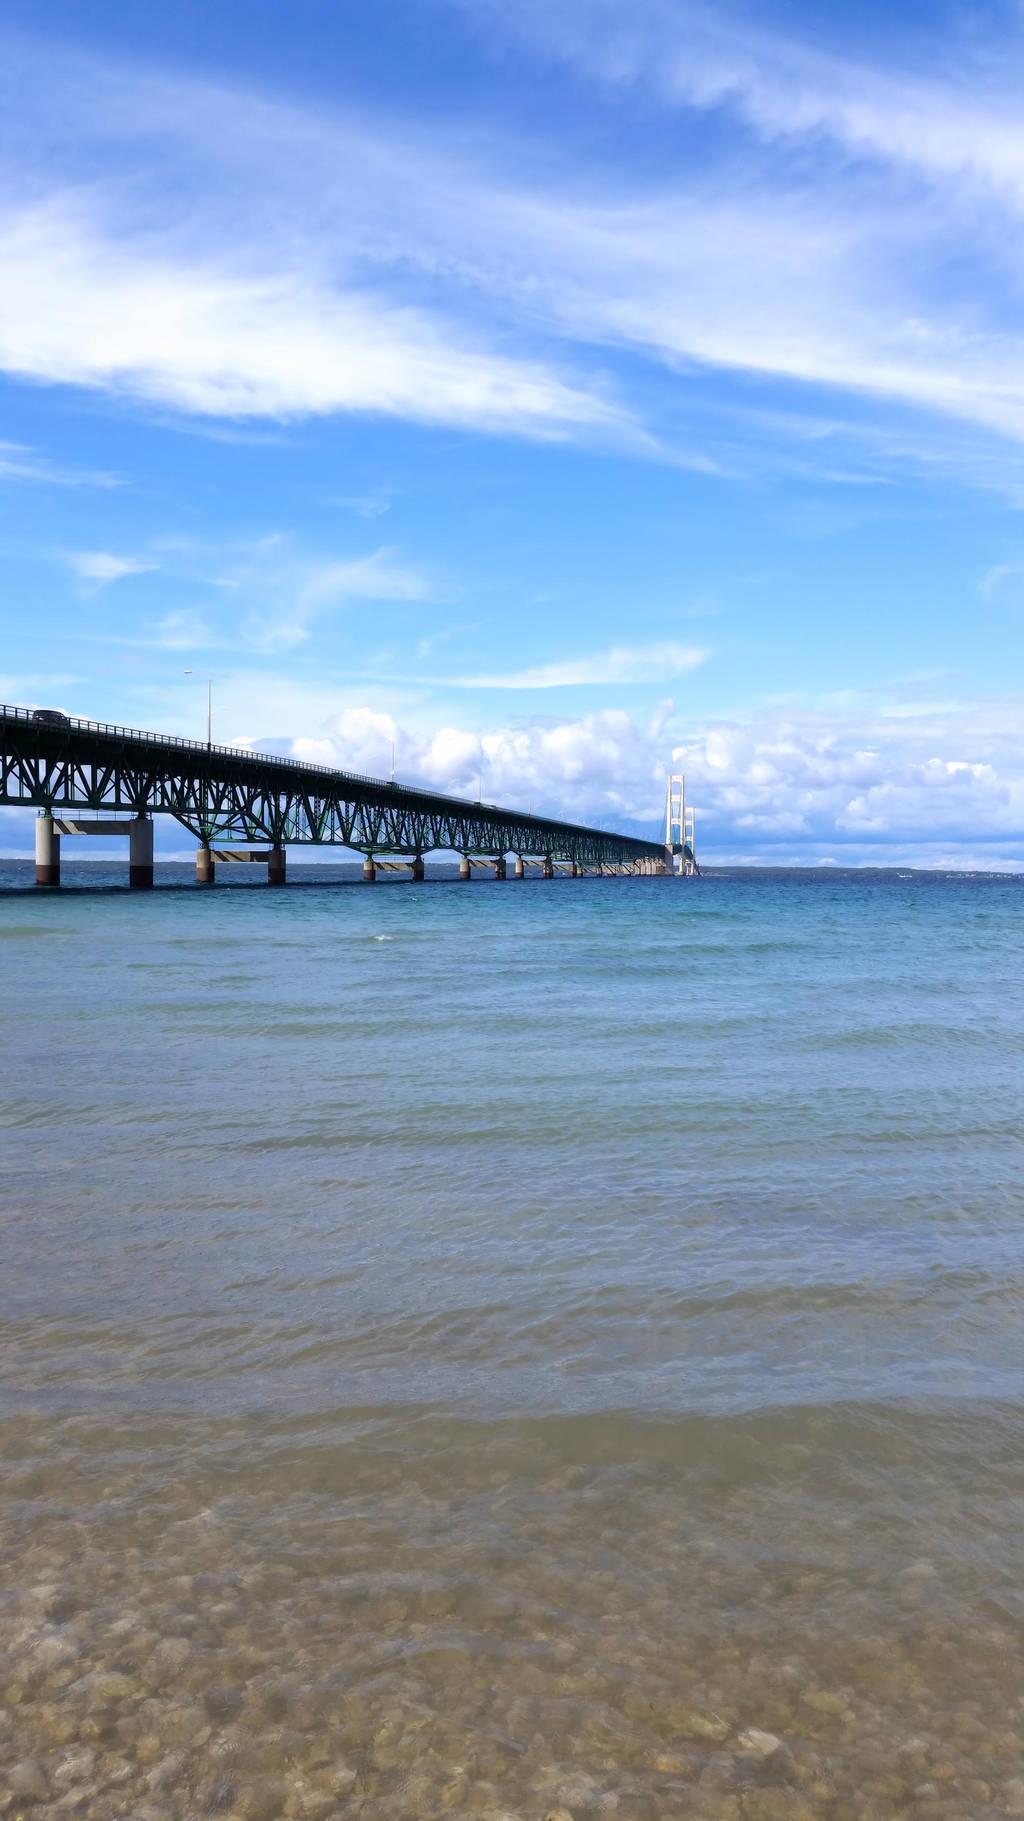 Mackinaw Bridge Tall by euphoricallydead